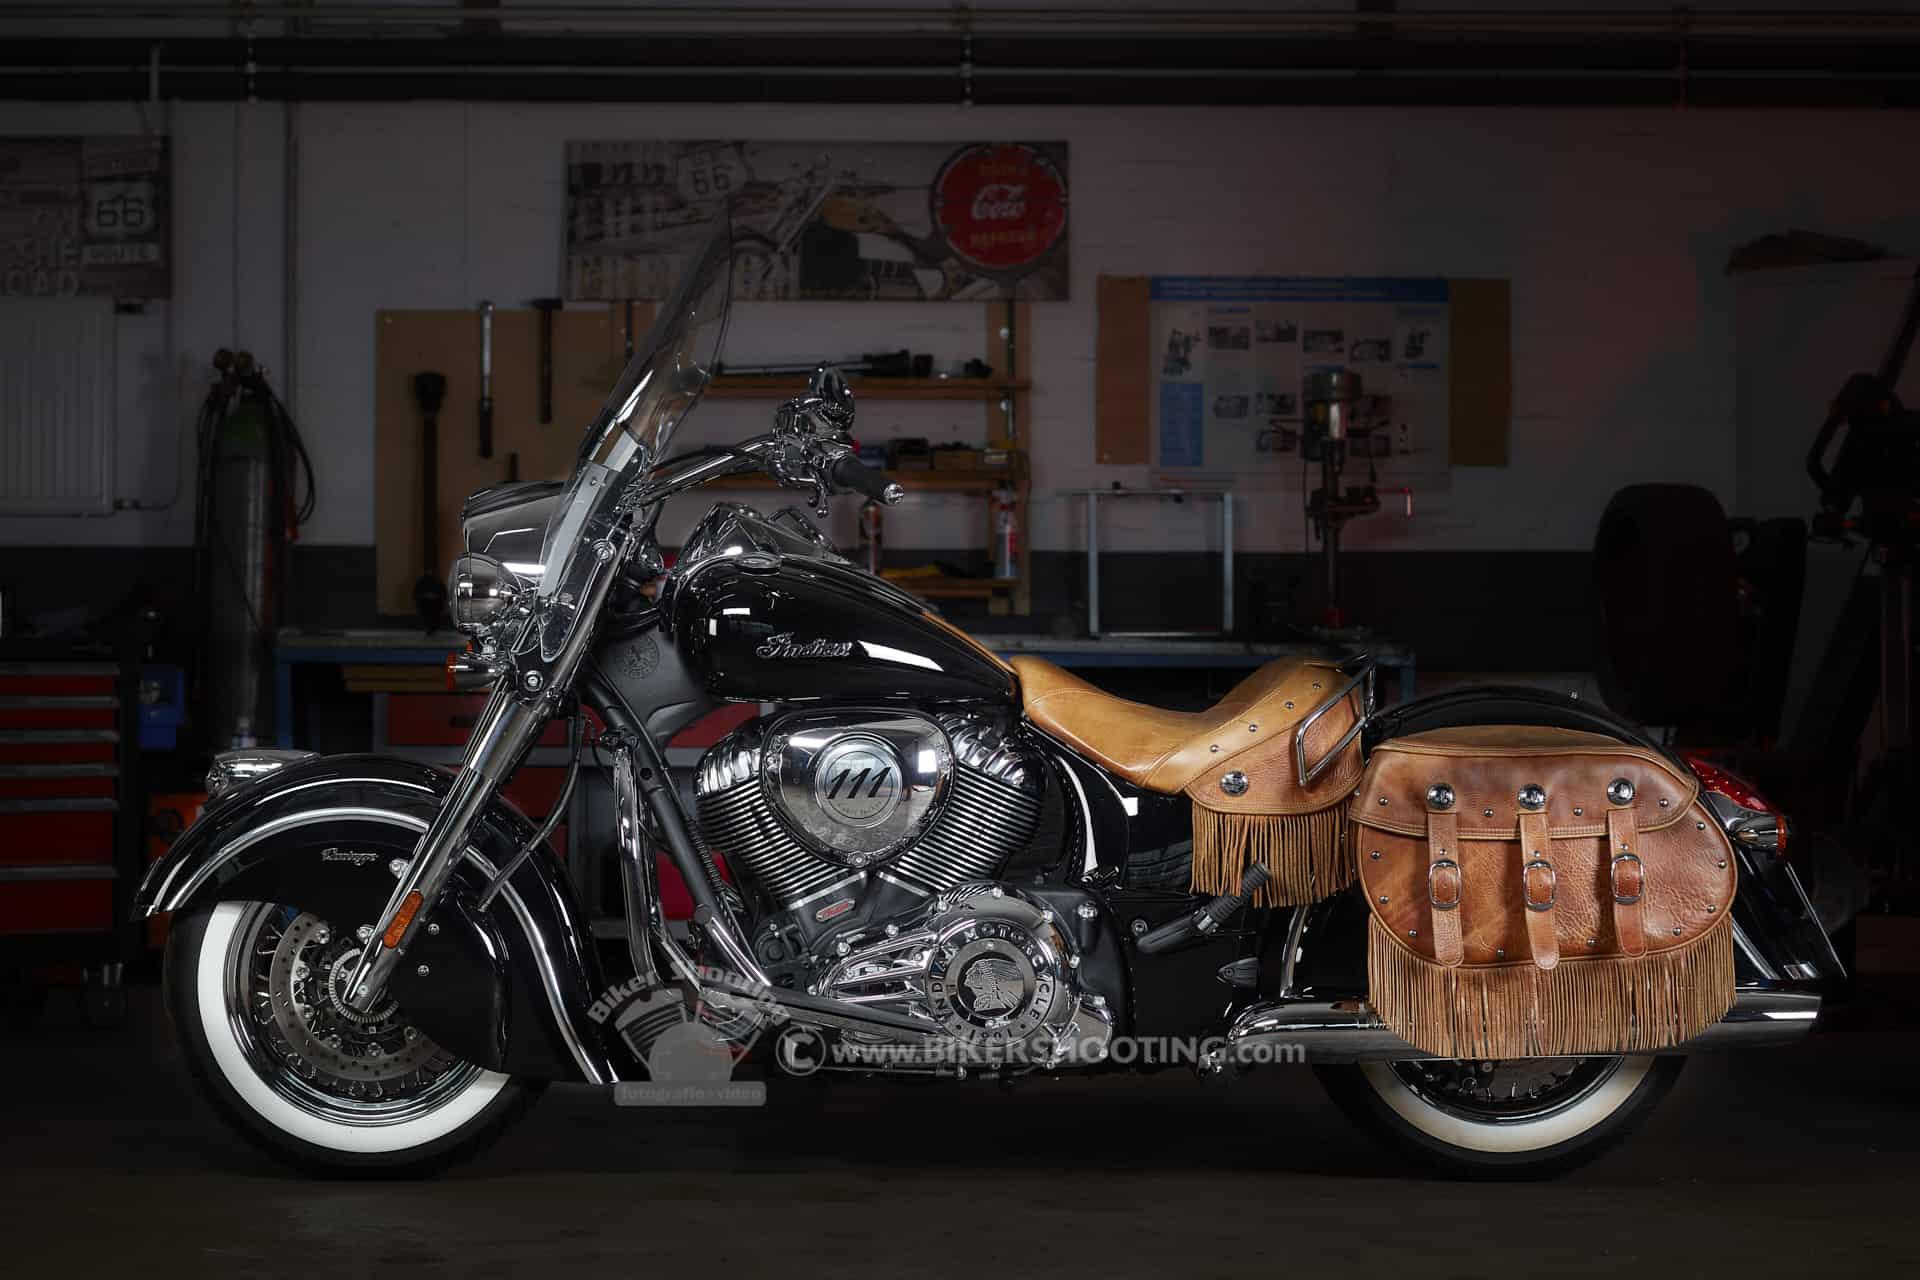 Indian Chief Biker Fotoshooting STUDIO Fotoshooting motorrad shooting, biker fotoshooting, fotoshooting mit motorrad, fotoshooting motorrad, motorrad fotoshooting